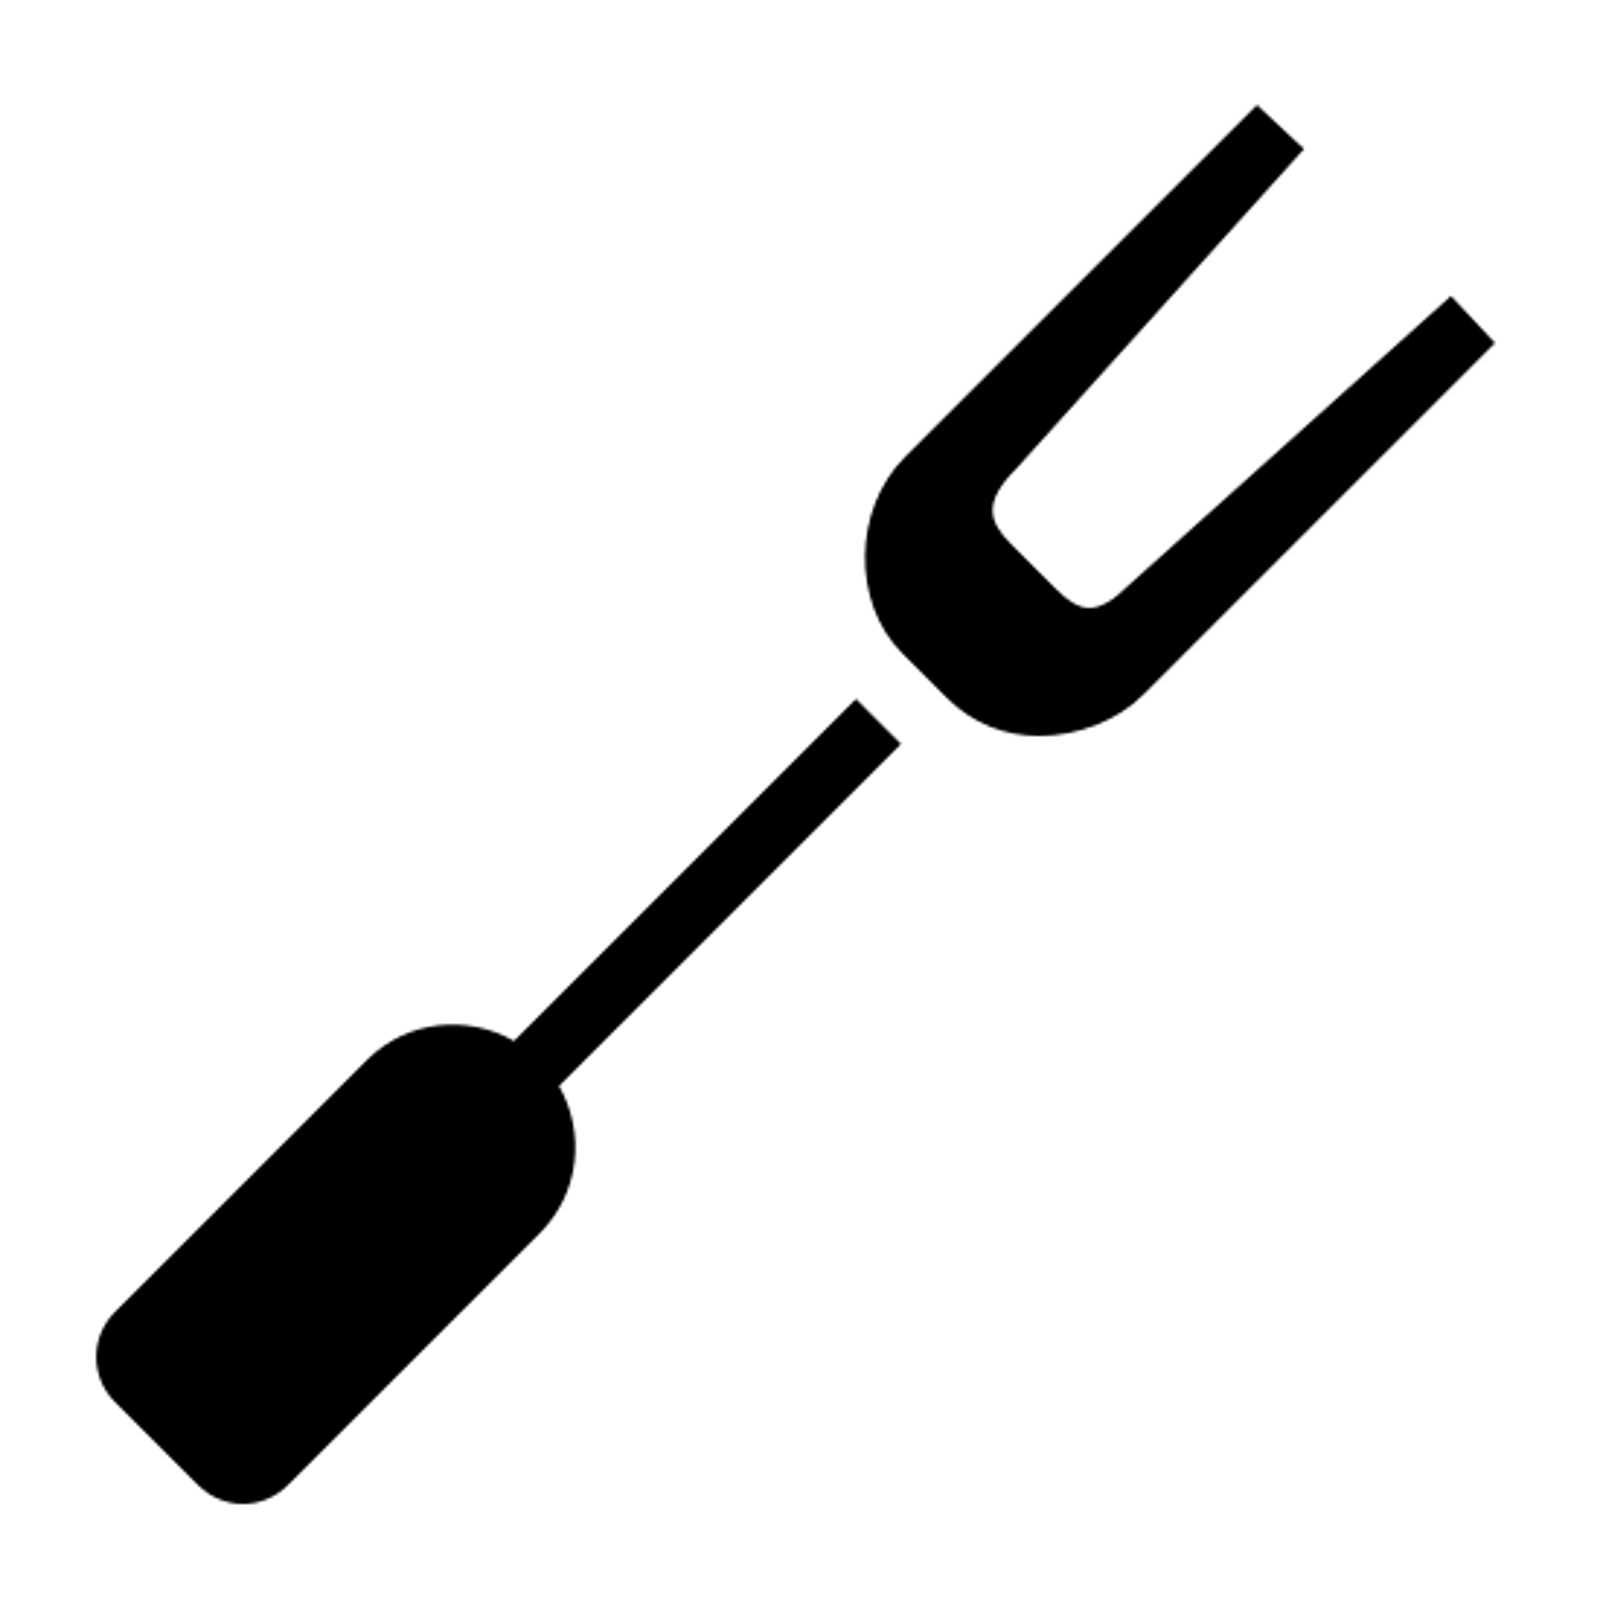 Gran Tenedor icon